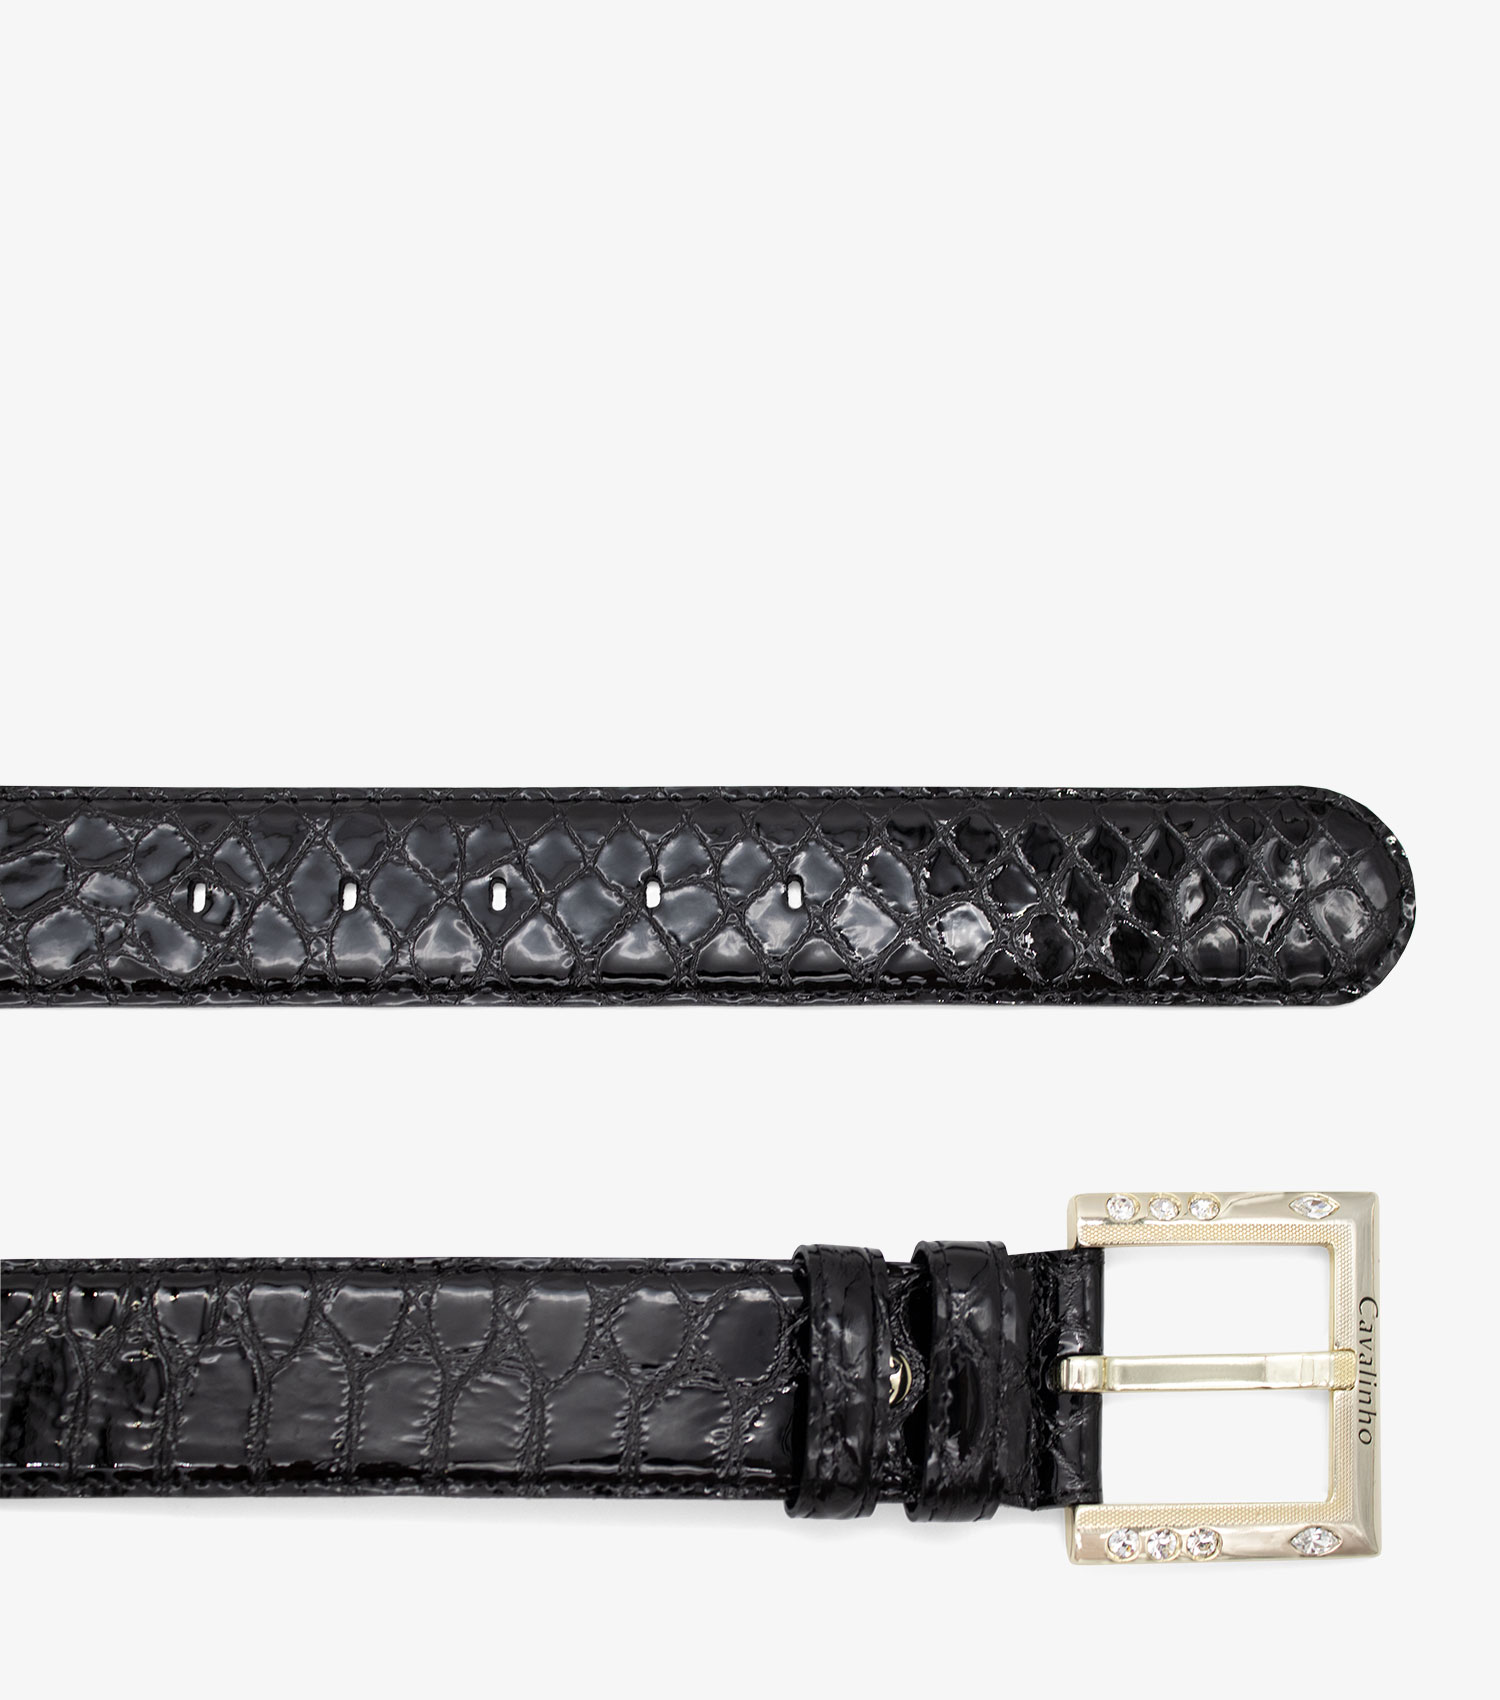 Galope Classic Belt